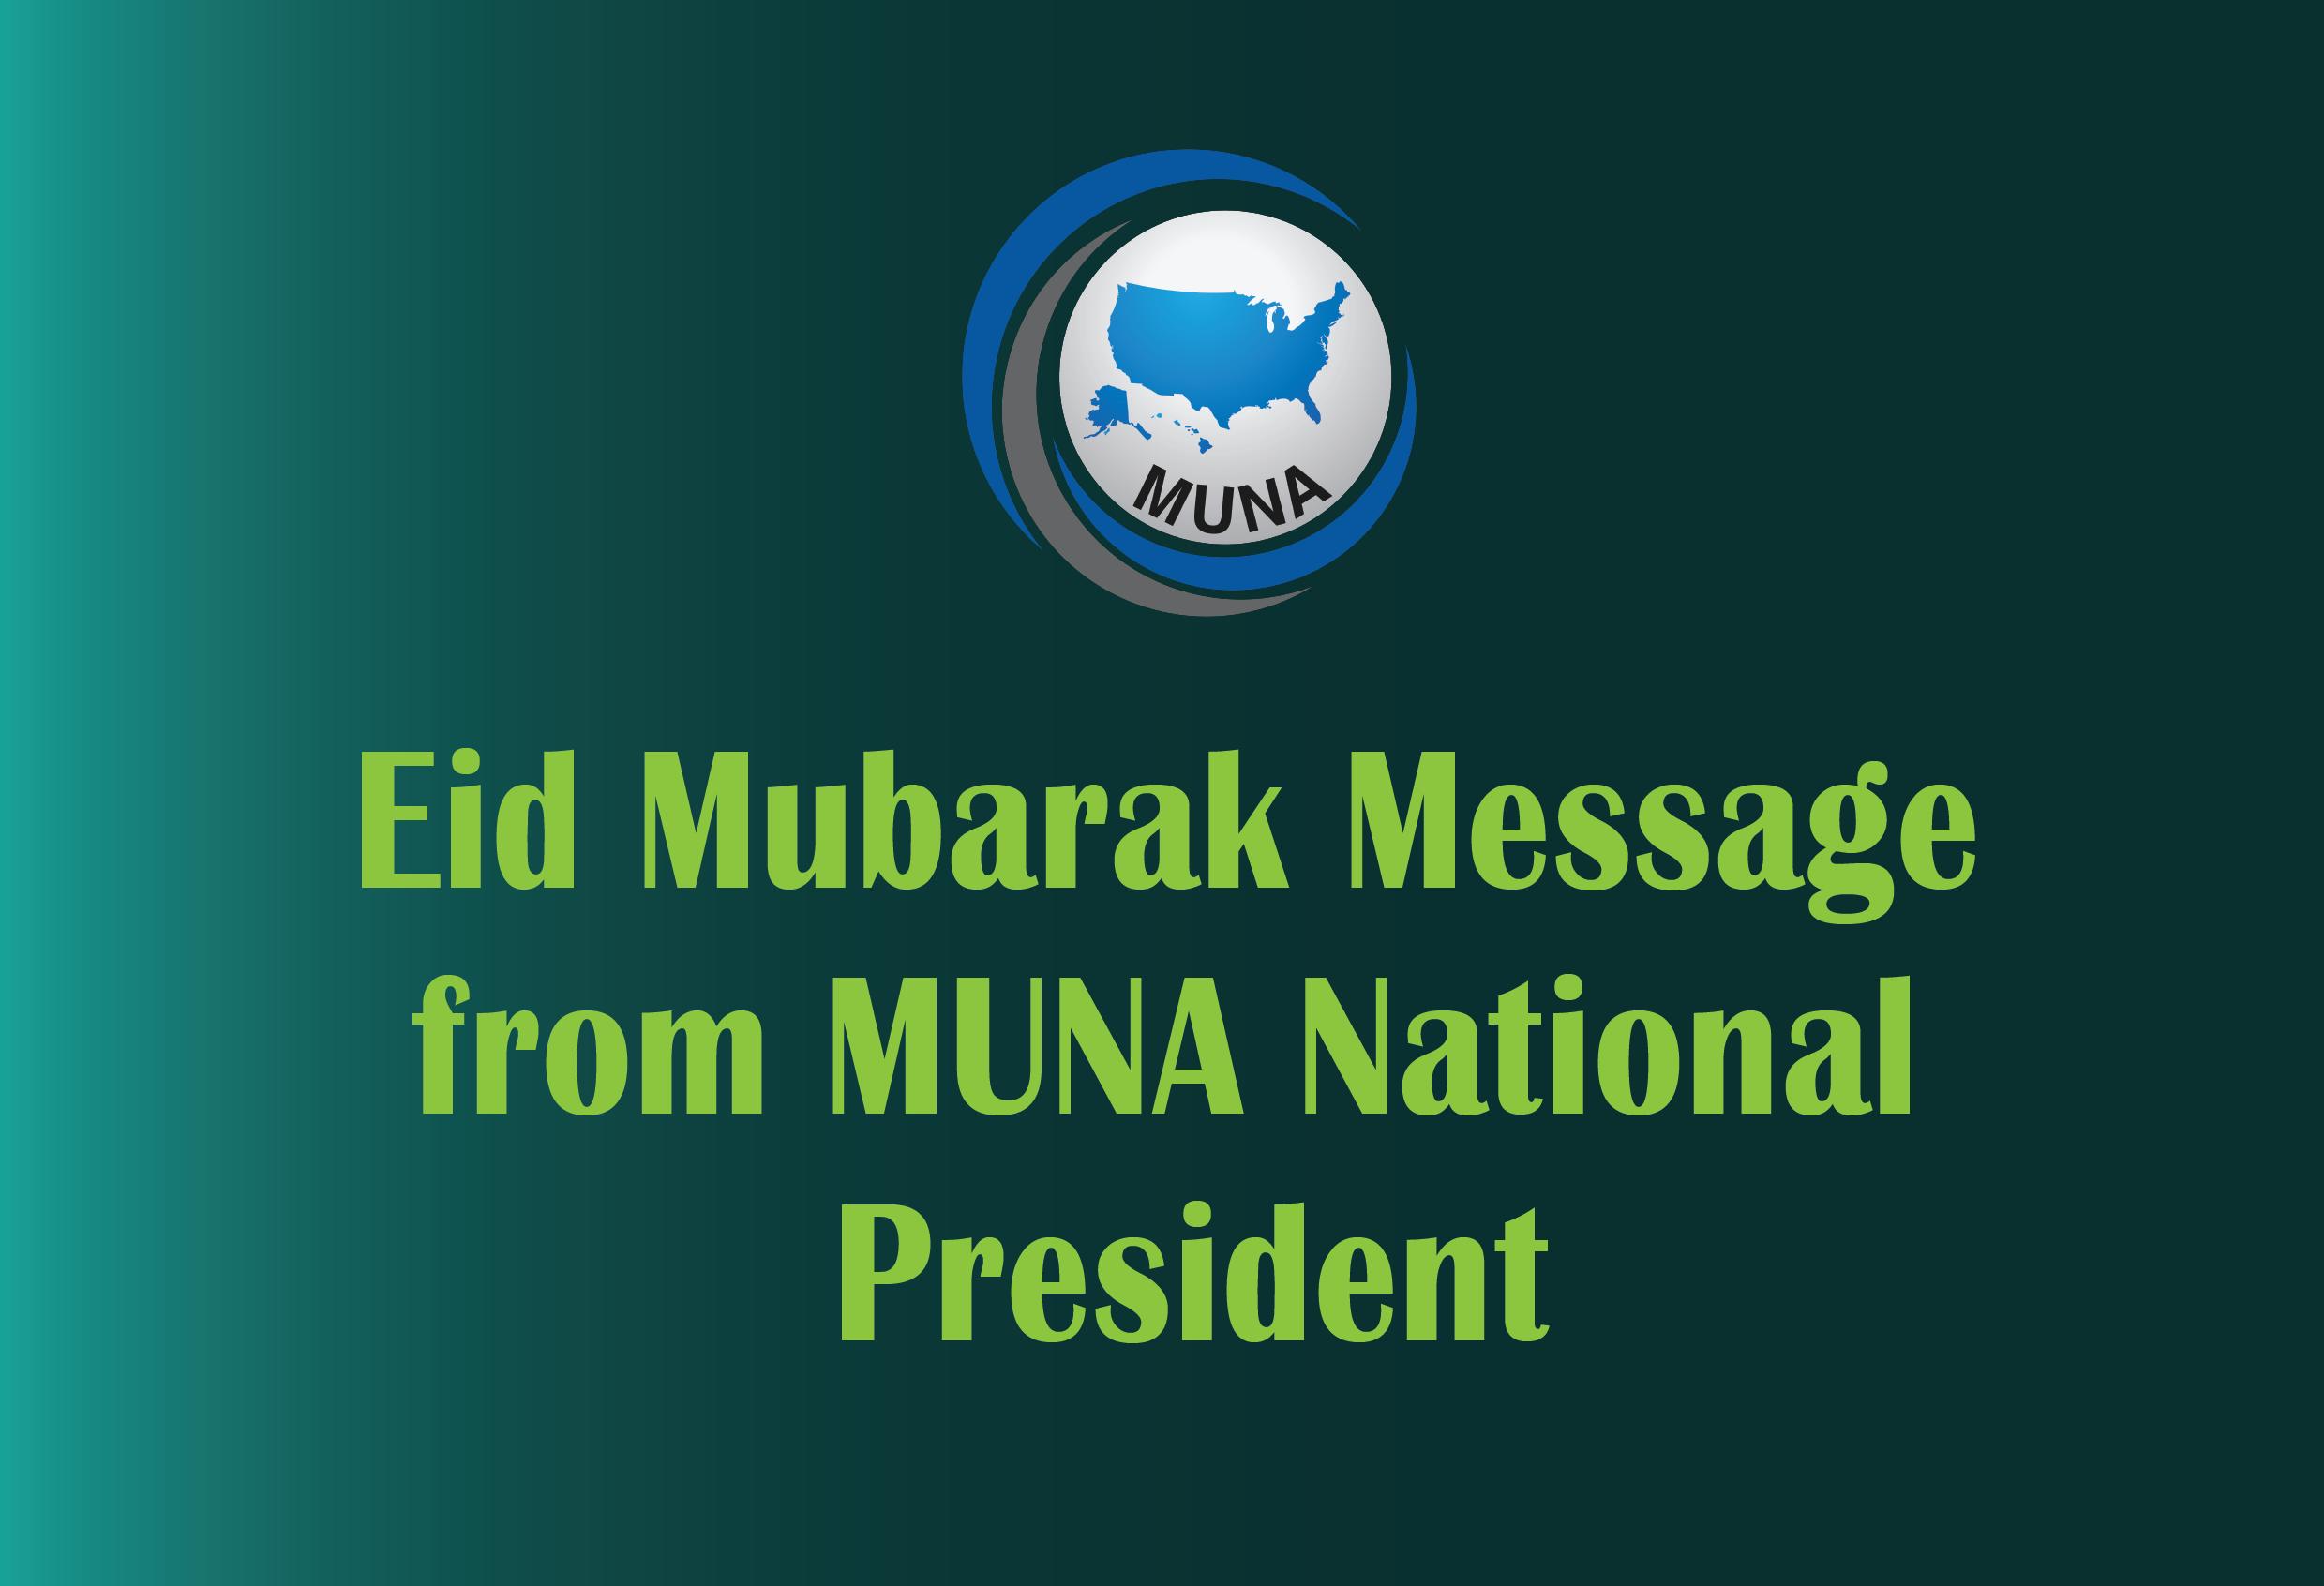 Eid Mubarak Message from  MUNA National President